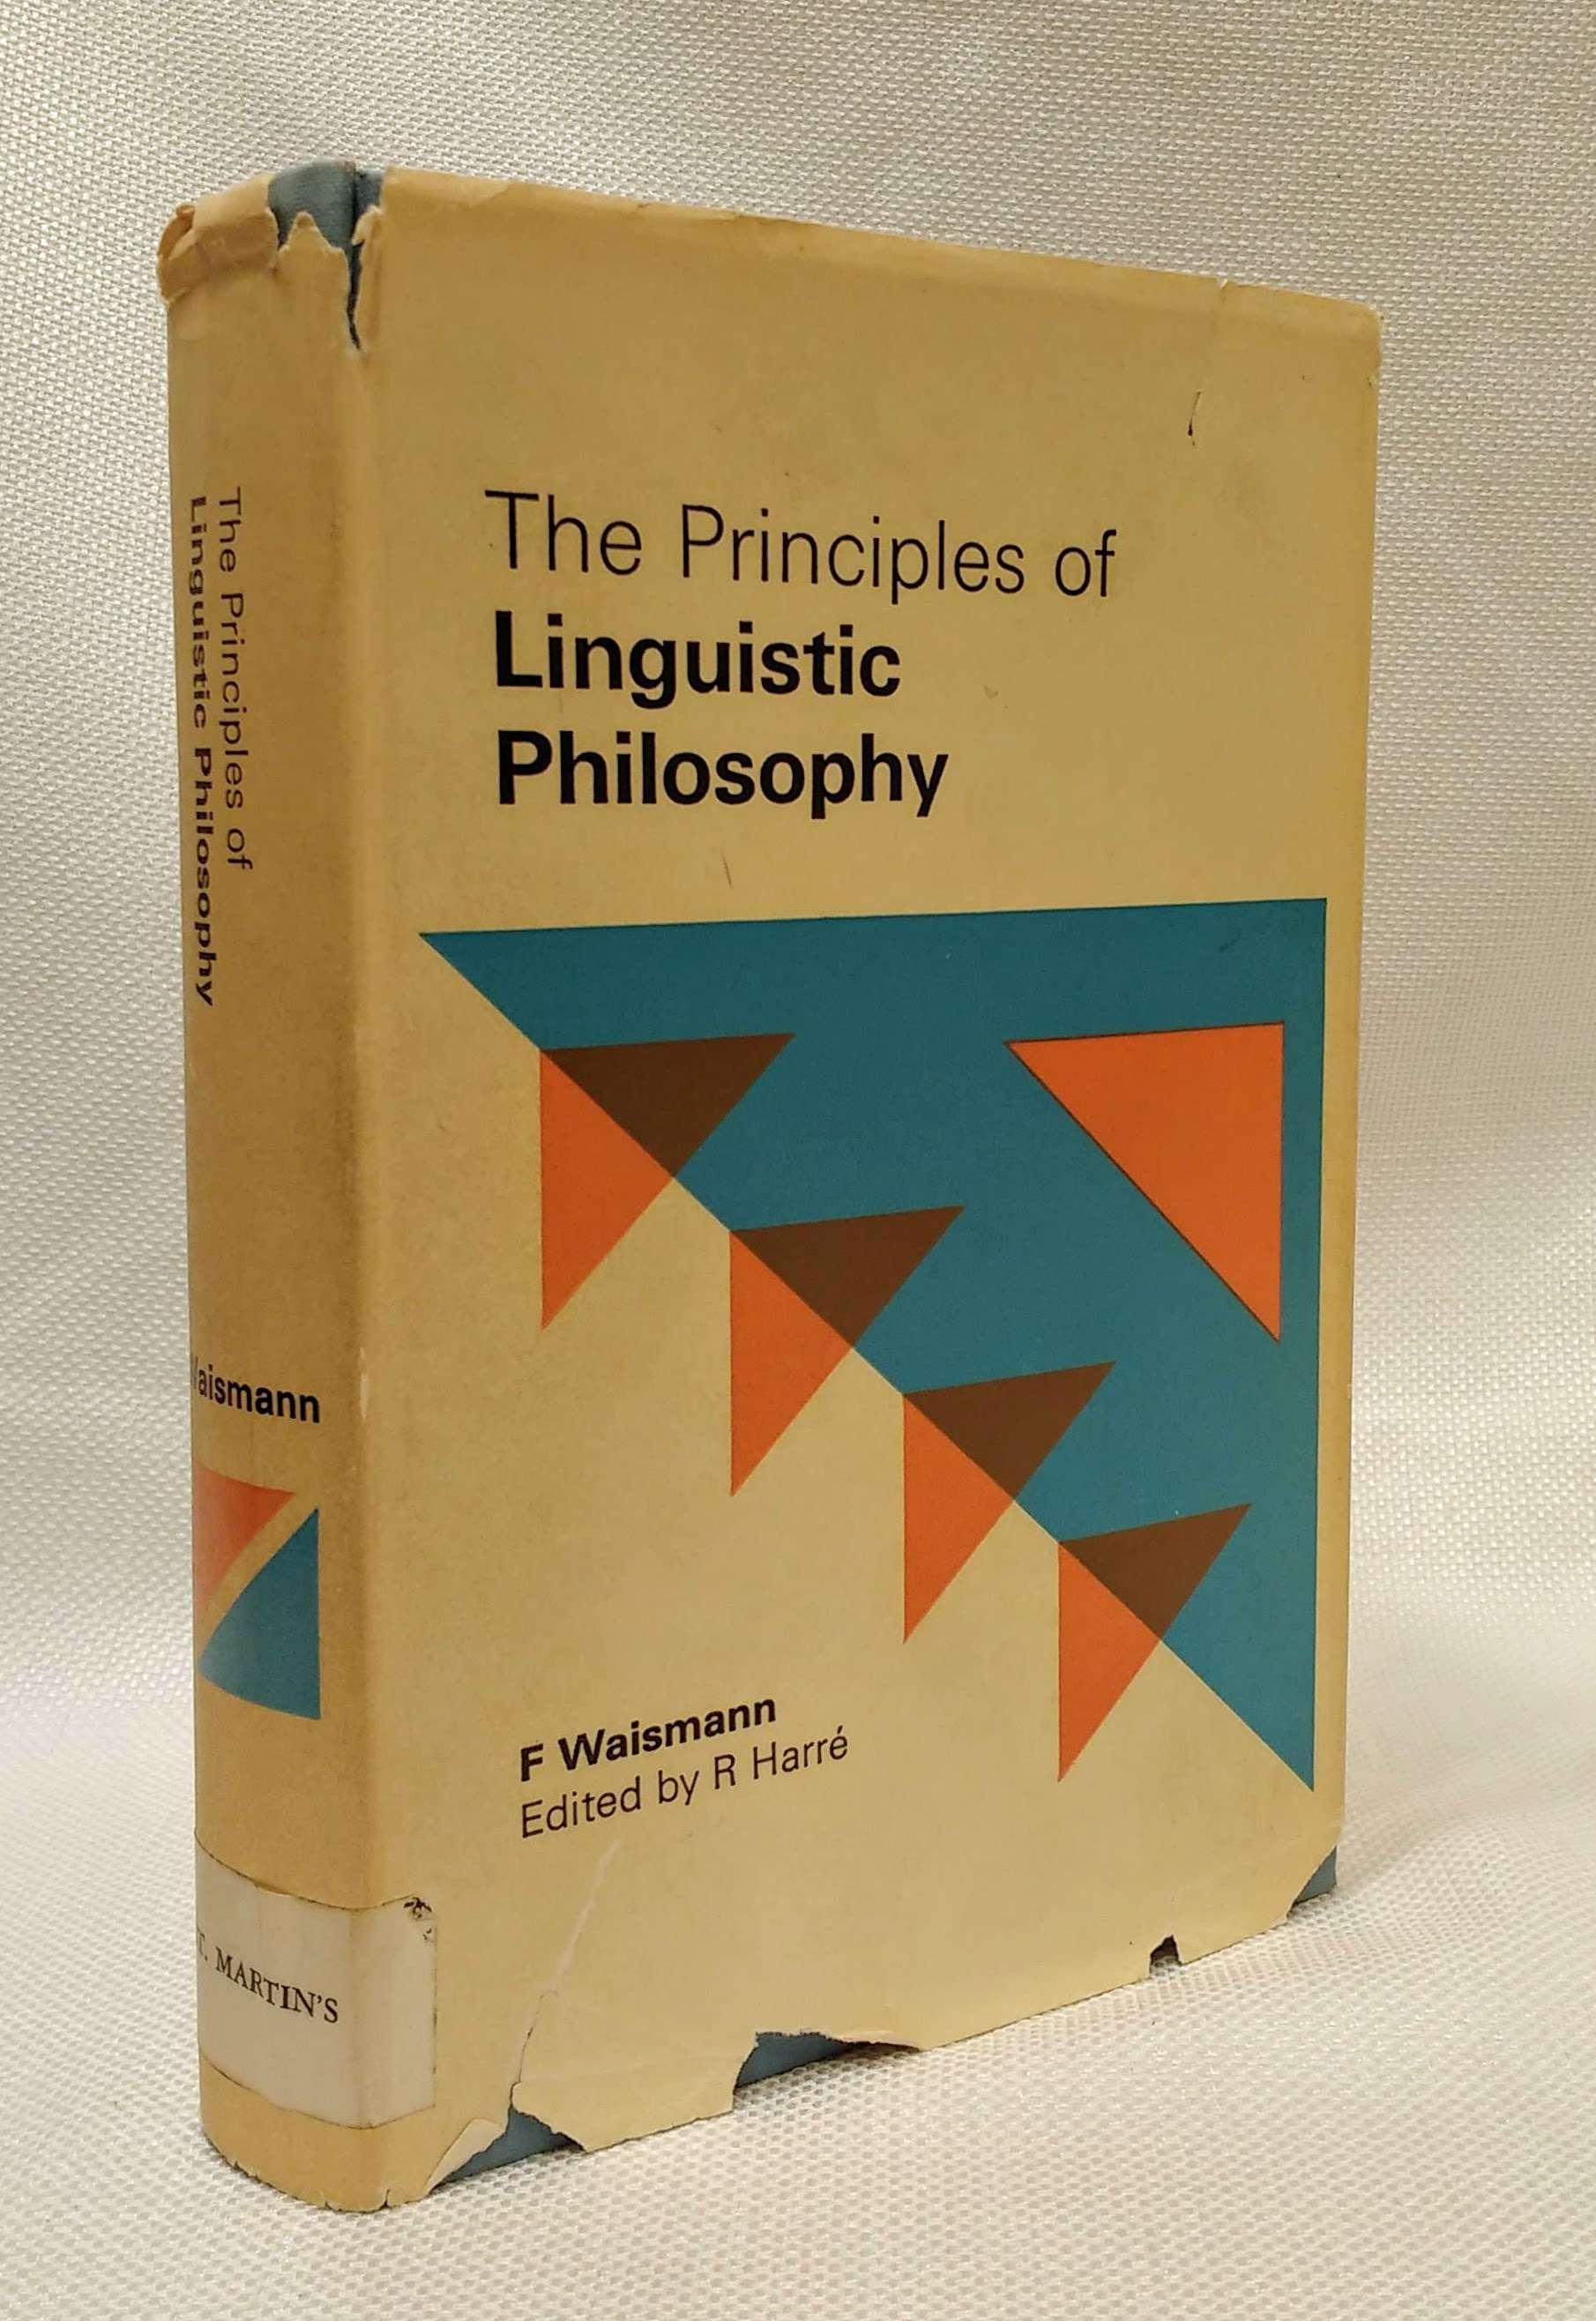 The Principles of Linguistic Philosophy, Waismann, F.; Harre, R. (ed.)